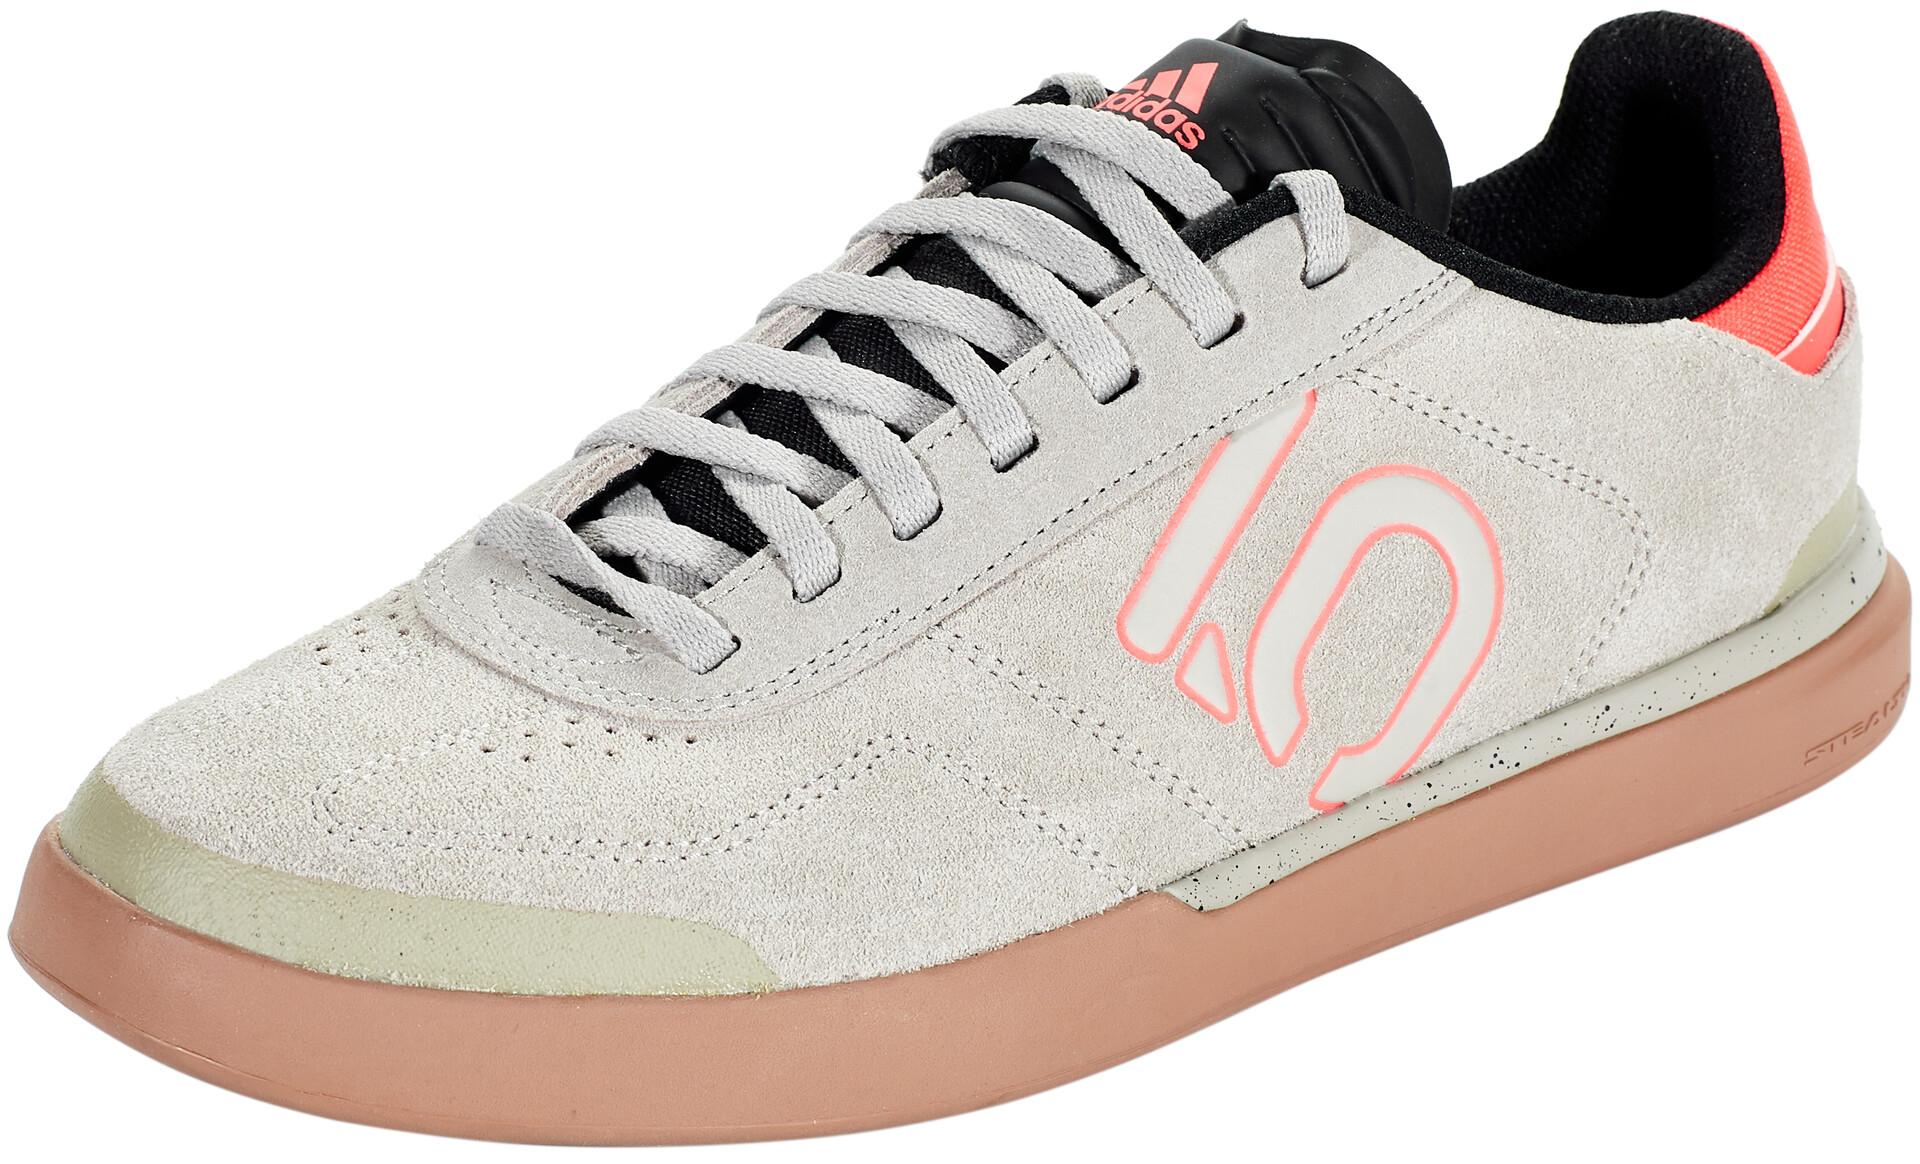 adidas Five Ten Sleuth DLX Chaussures pour VTT Homme, sesameshock redgum M2